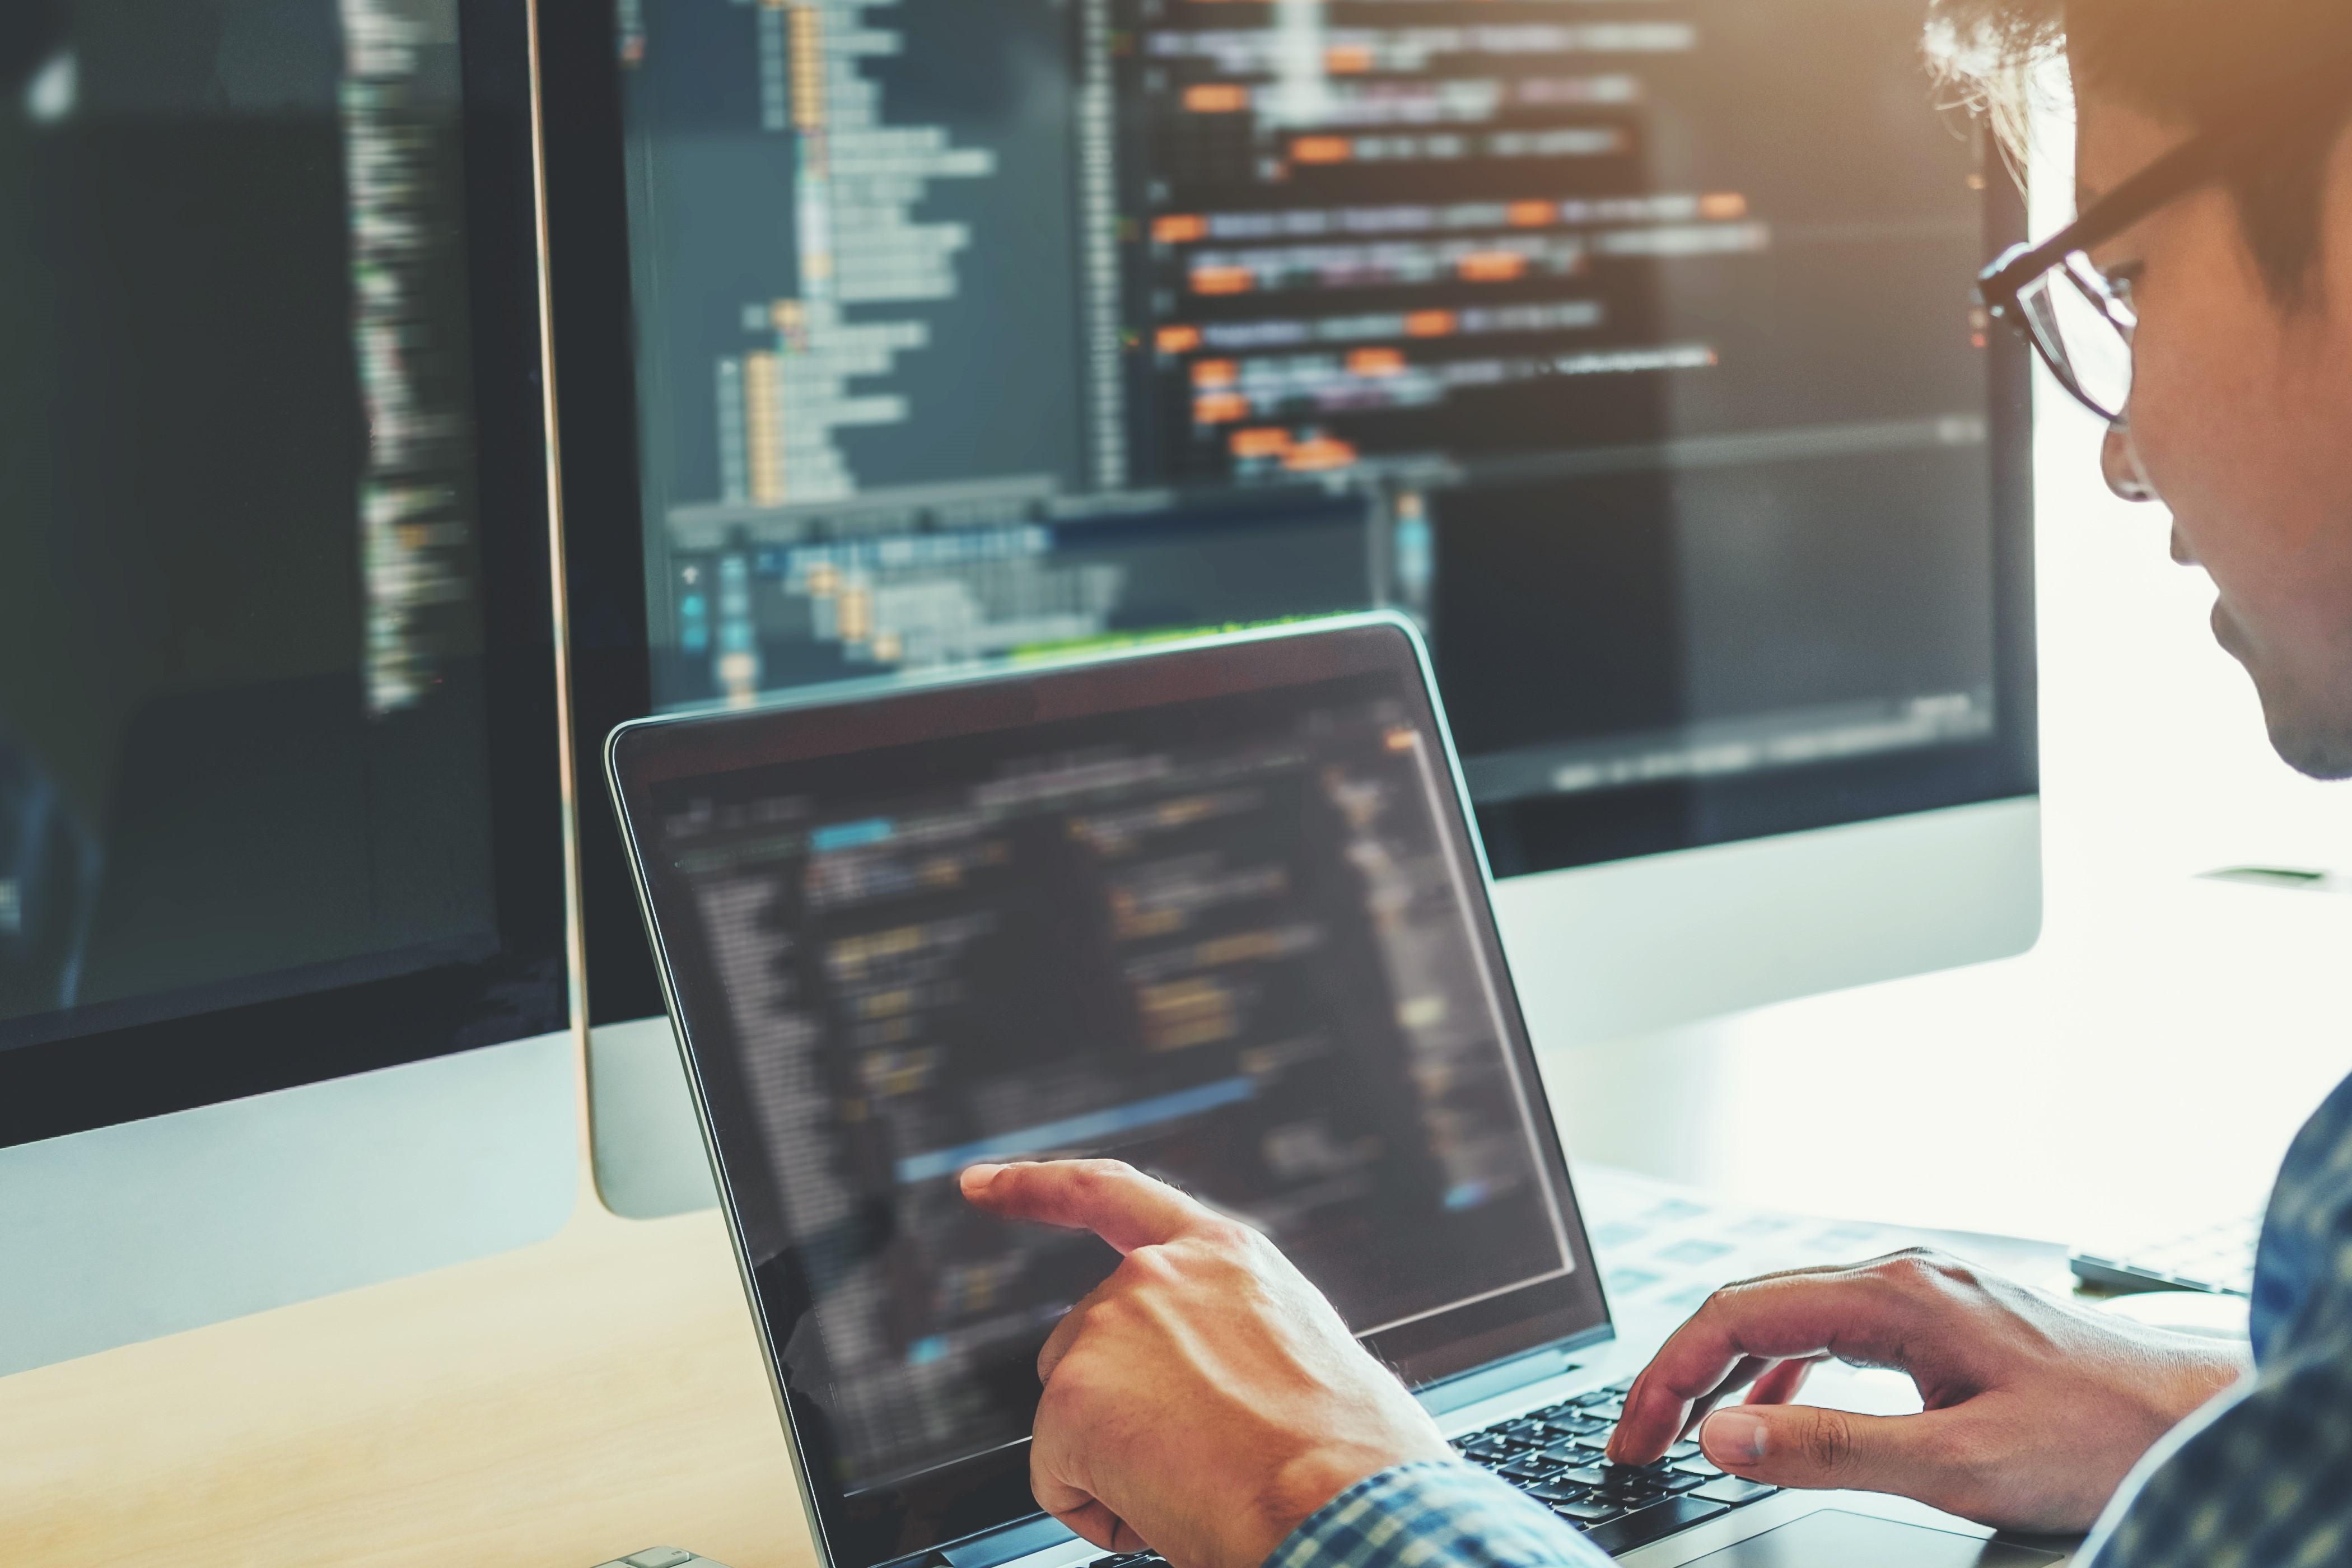 What to Avoid When Choosing a Web Developer